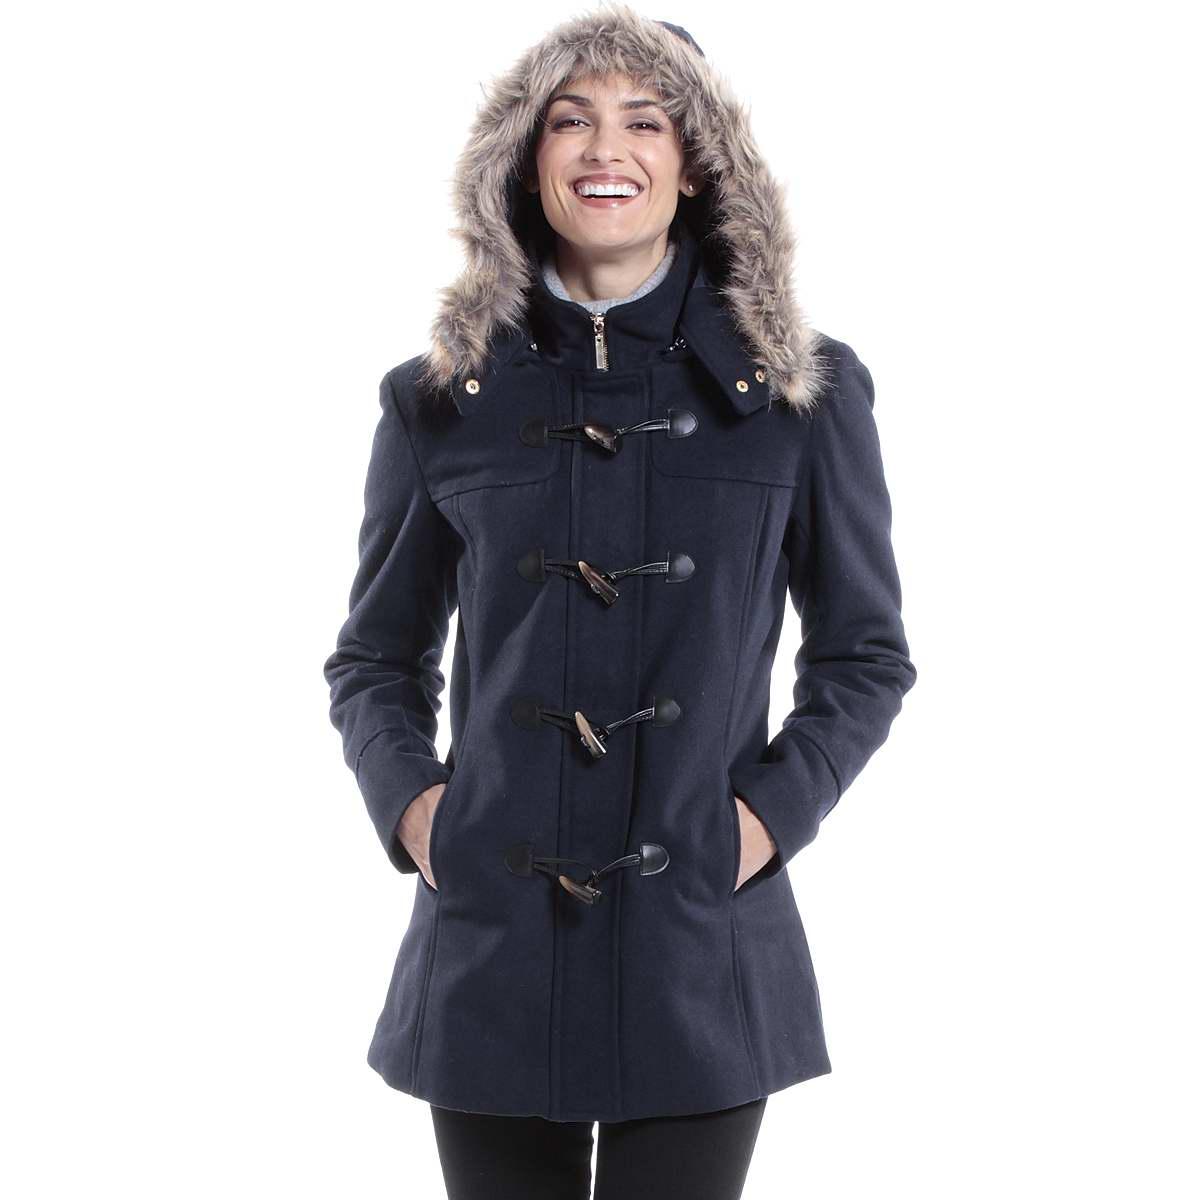 Hooded womens coat